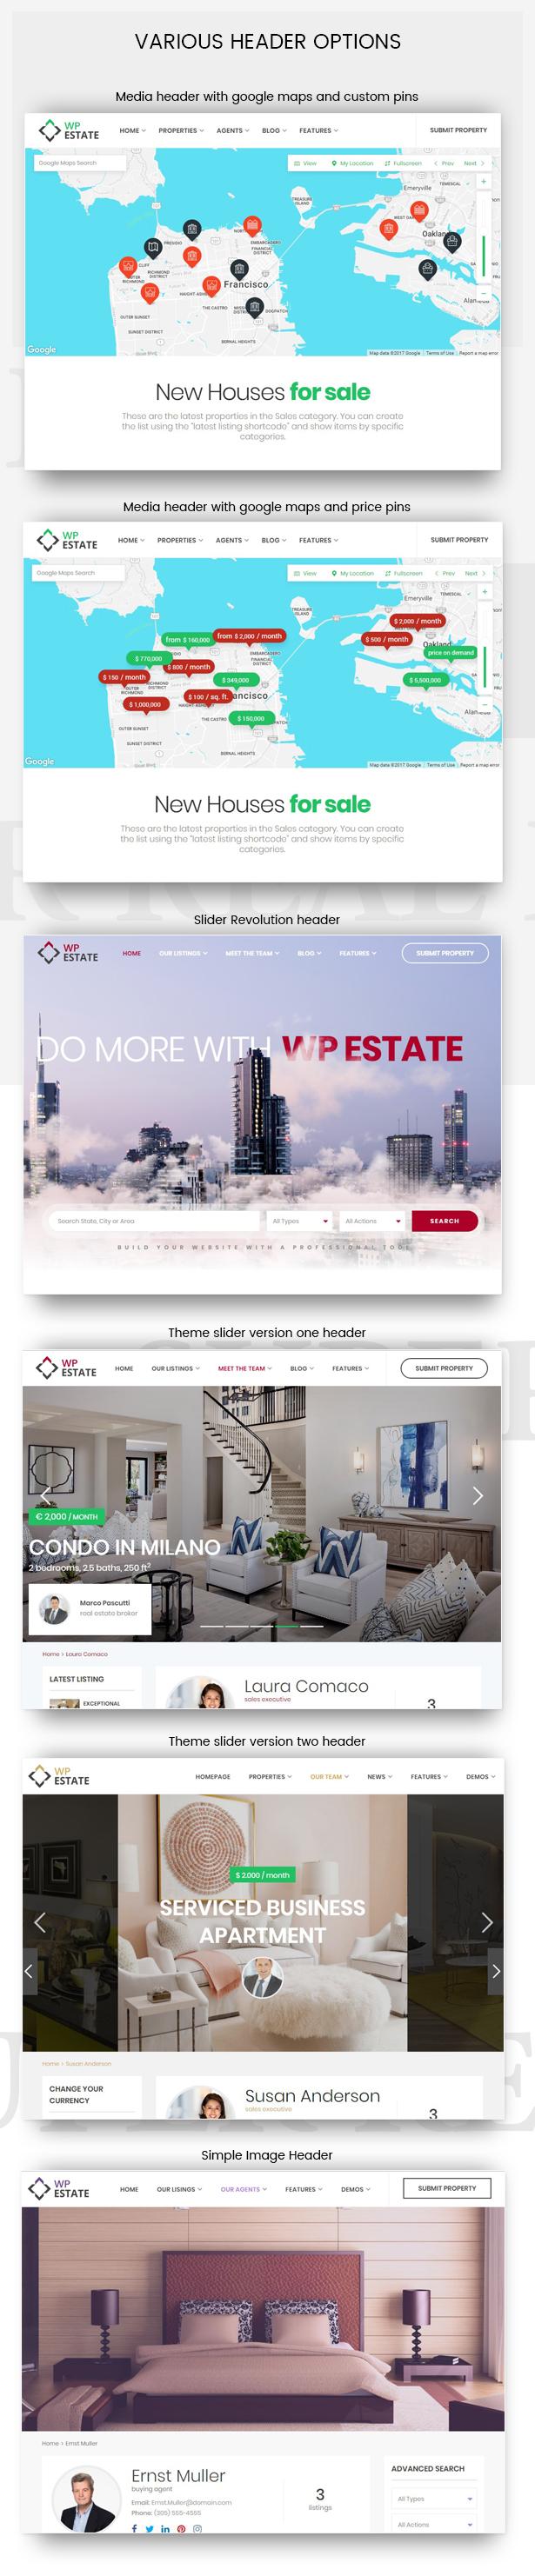 4media headers - WpEstate Real Estate WordPress Theme